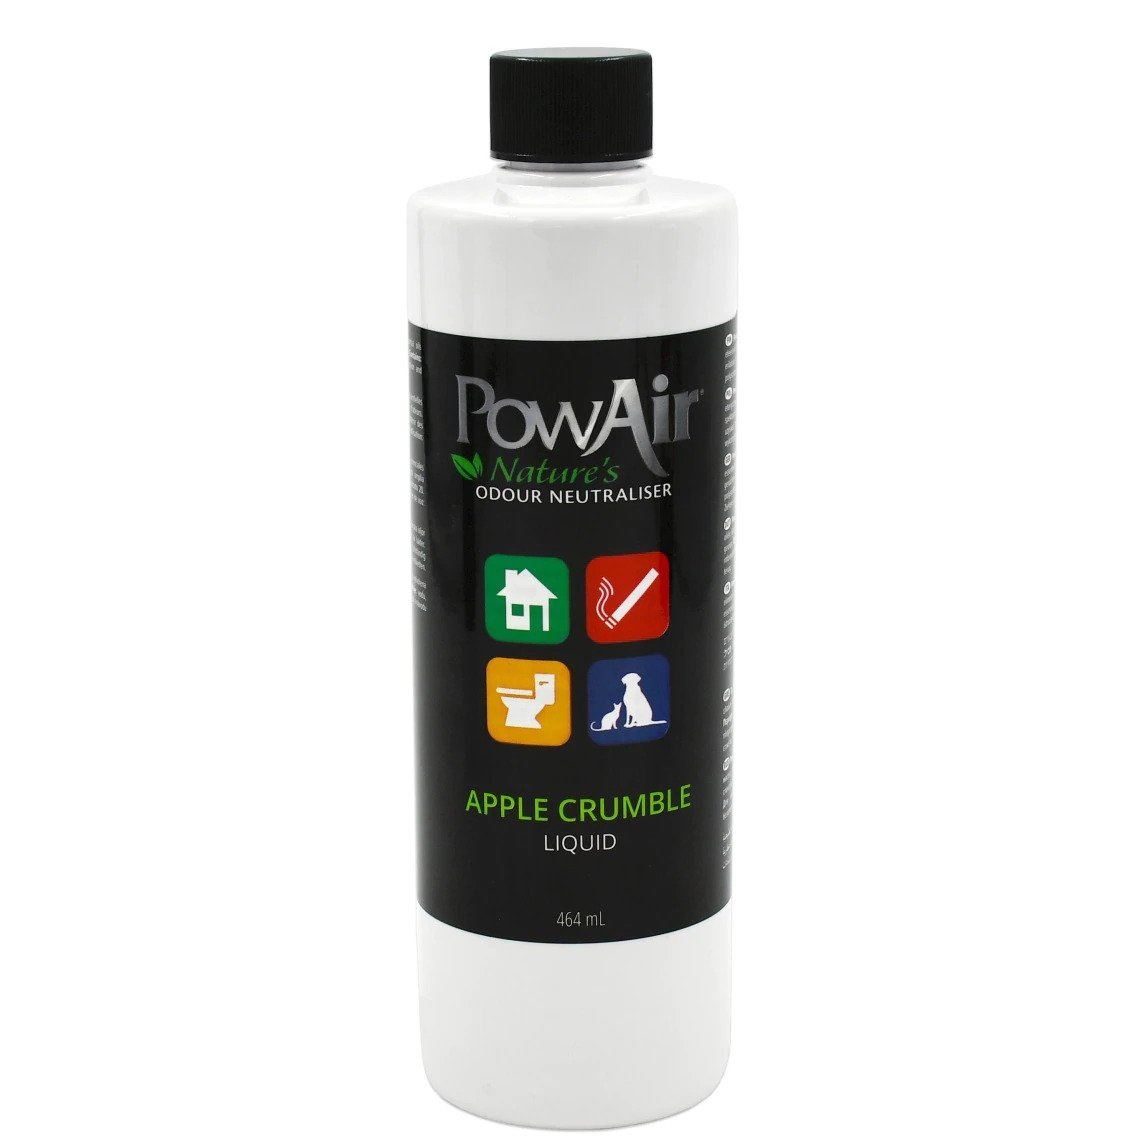 PowAir Liquid, Apple Crumble, 464ml imagine